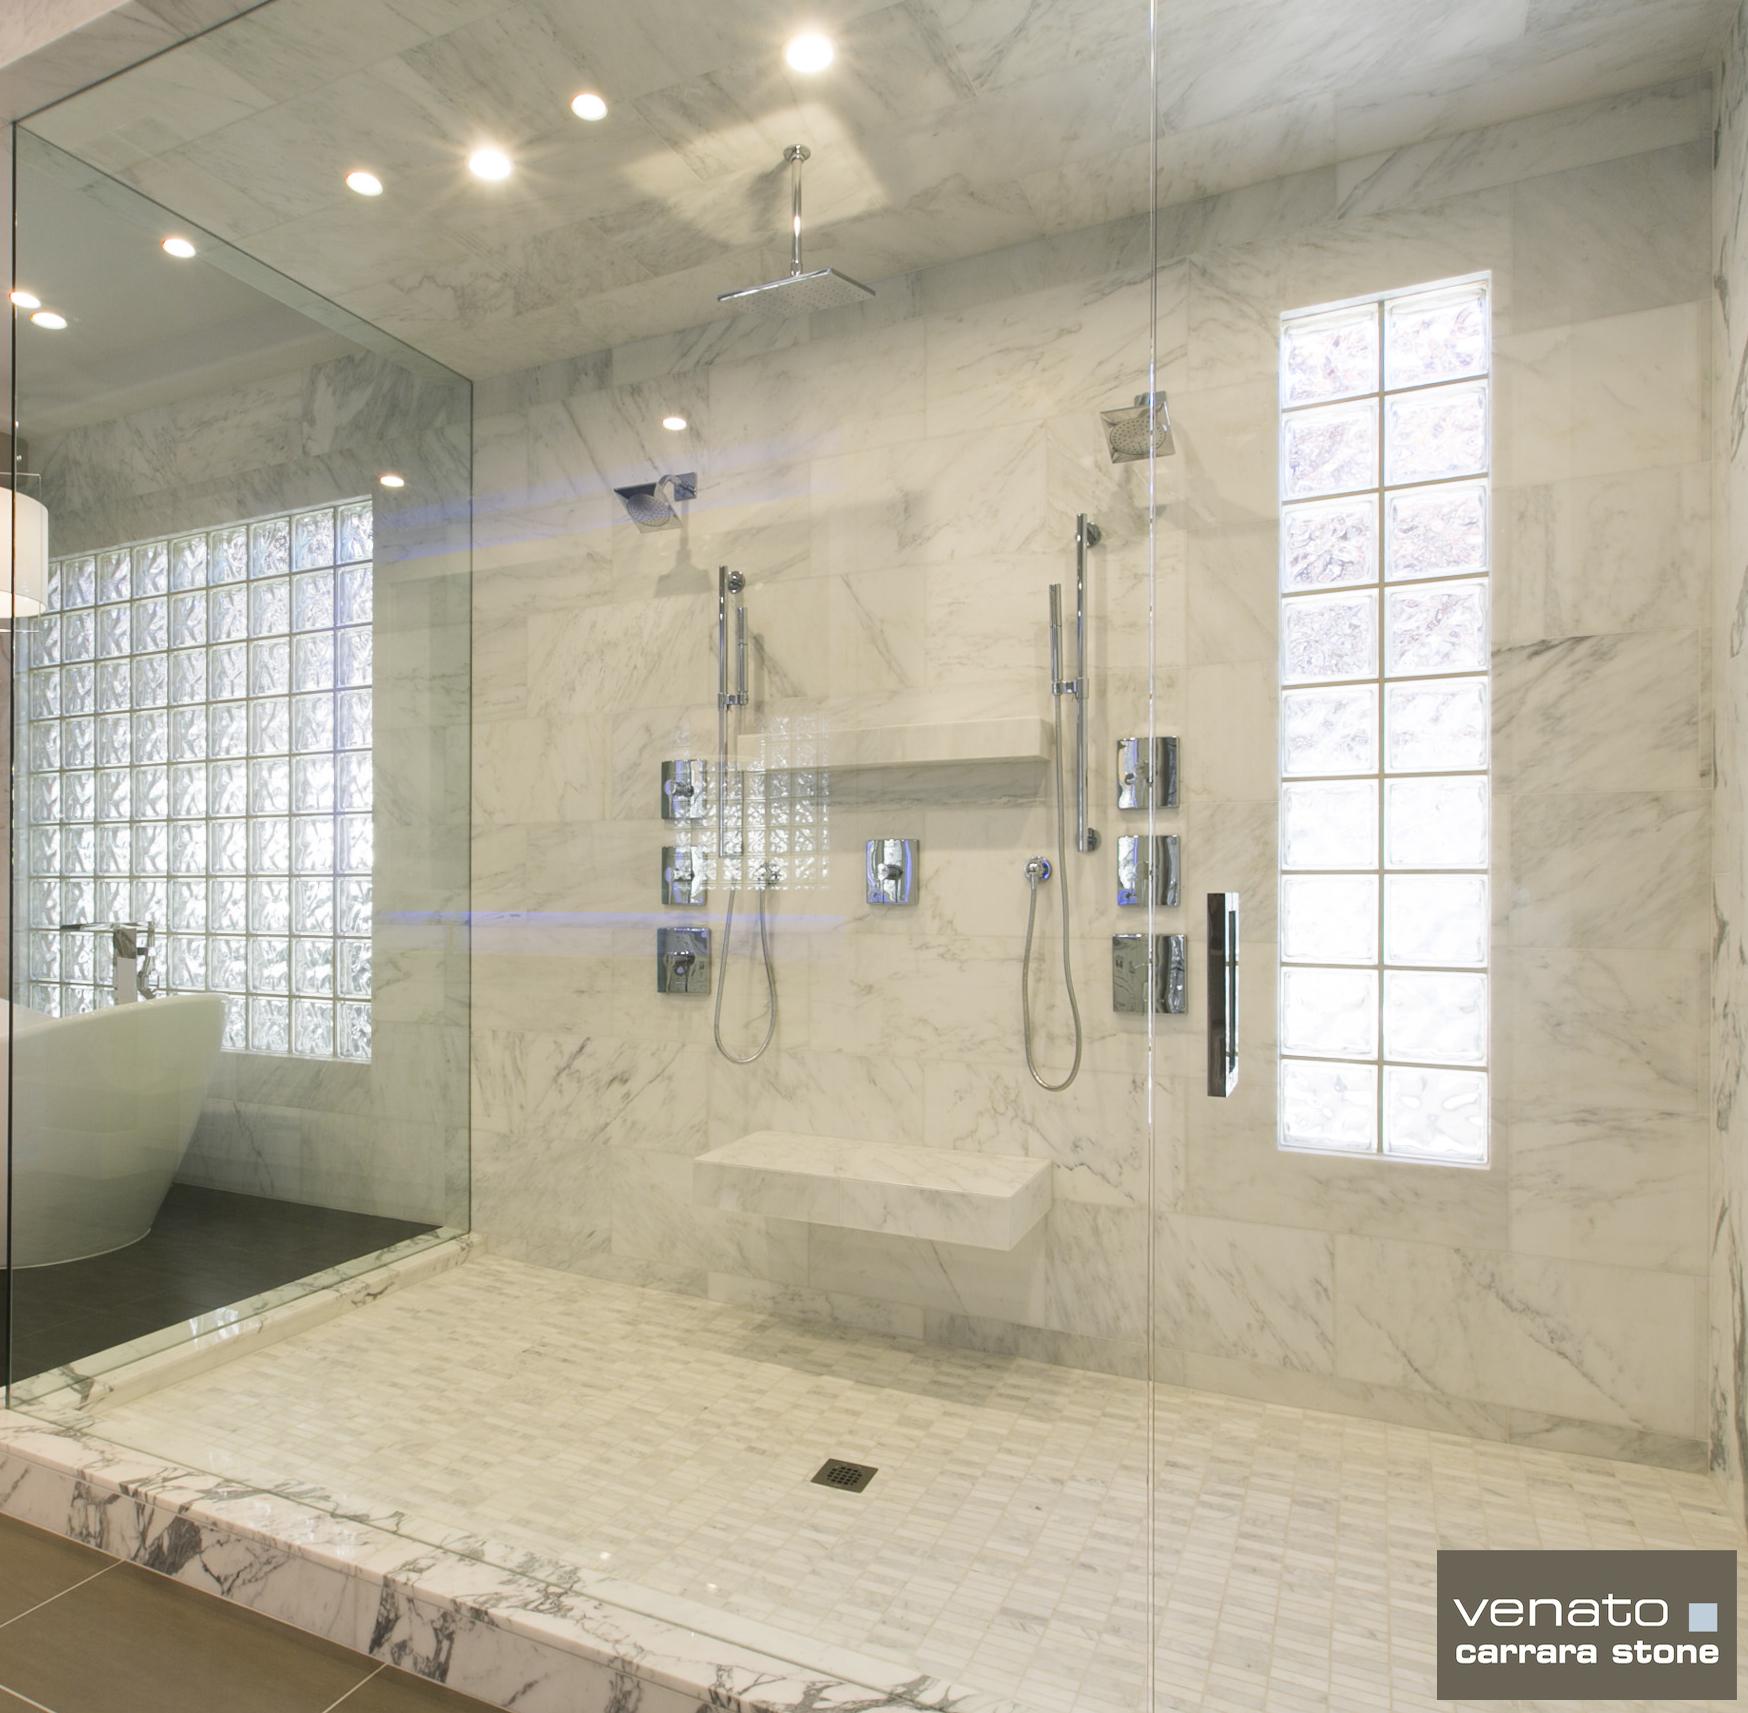 Carrara venato the builder depot blog - Carrara marble floor tile bathroom ...